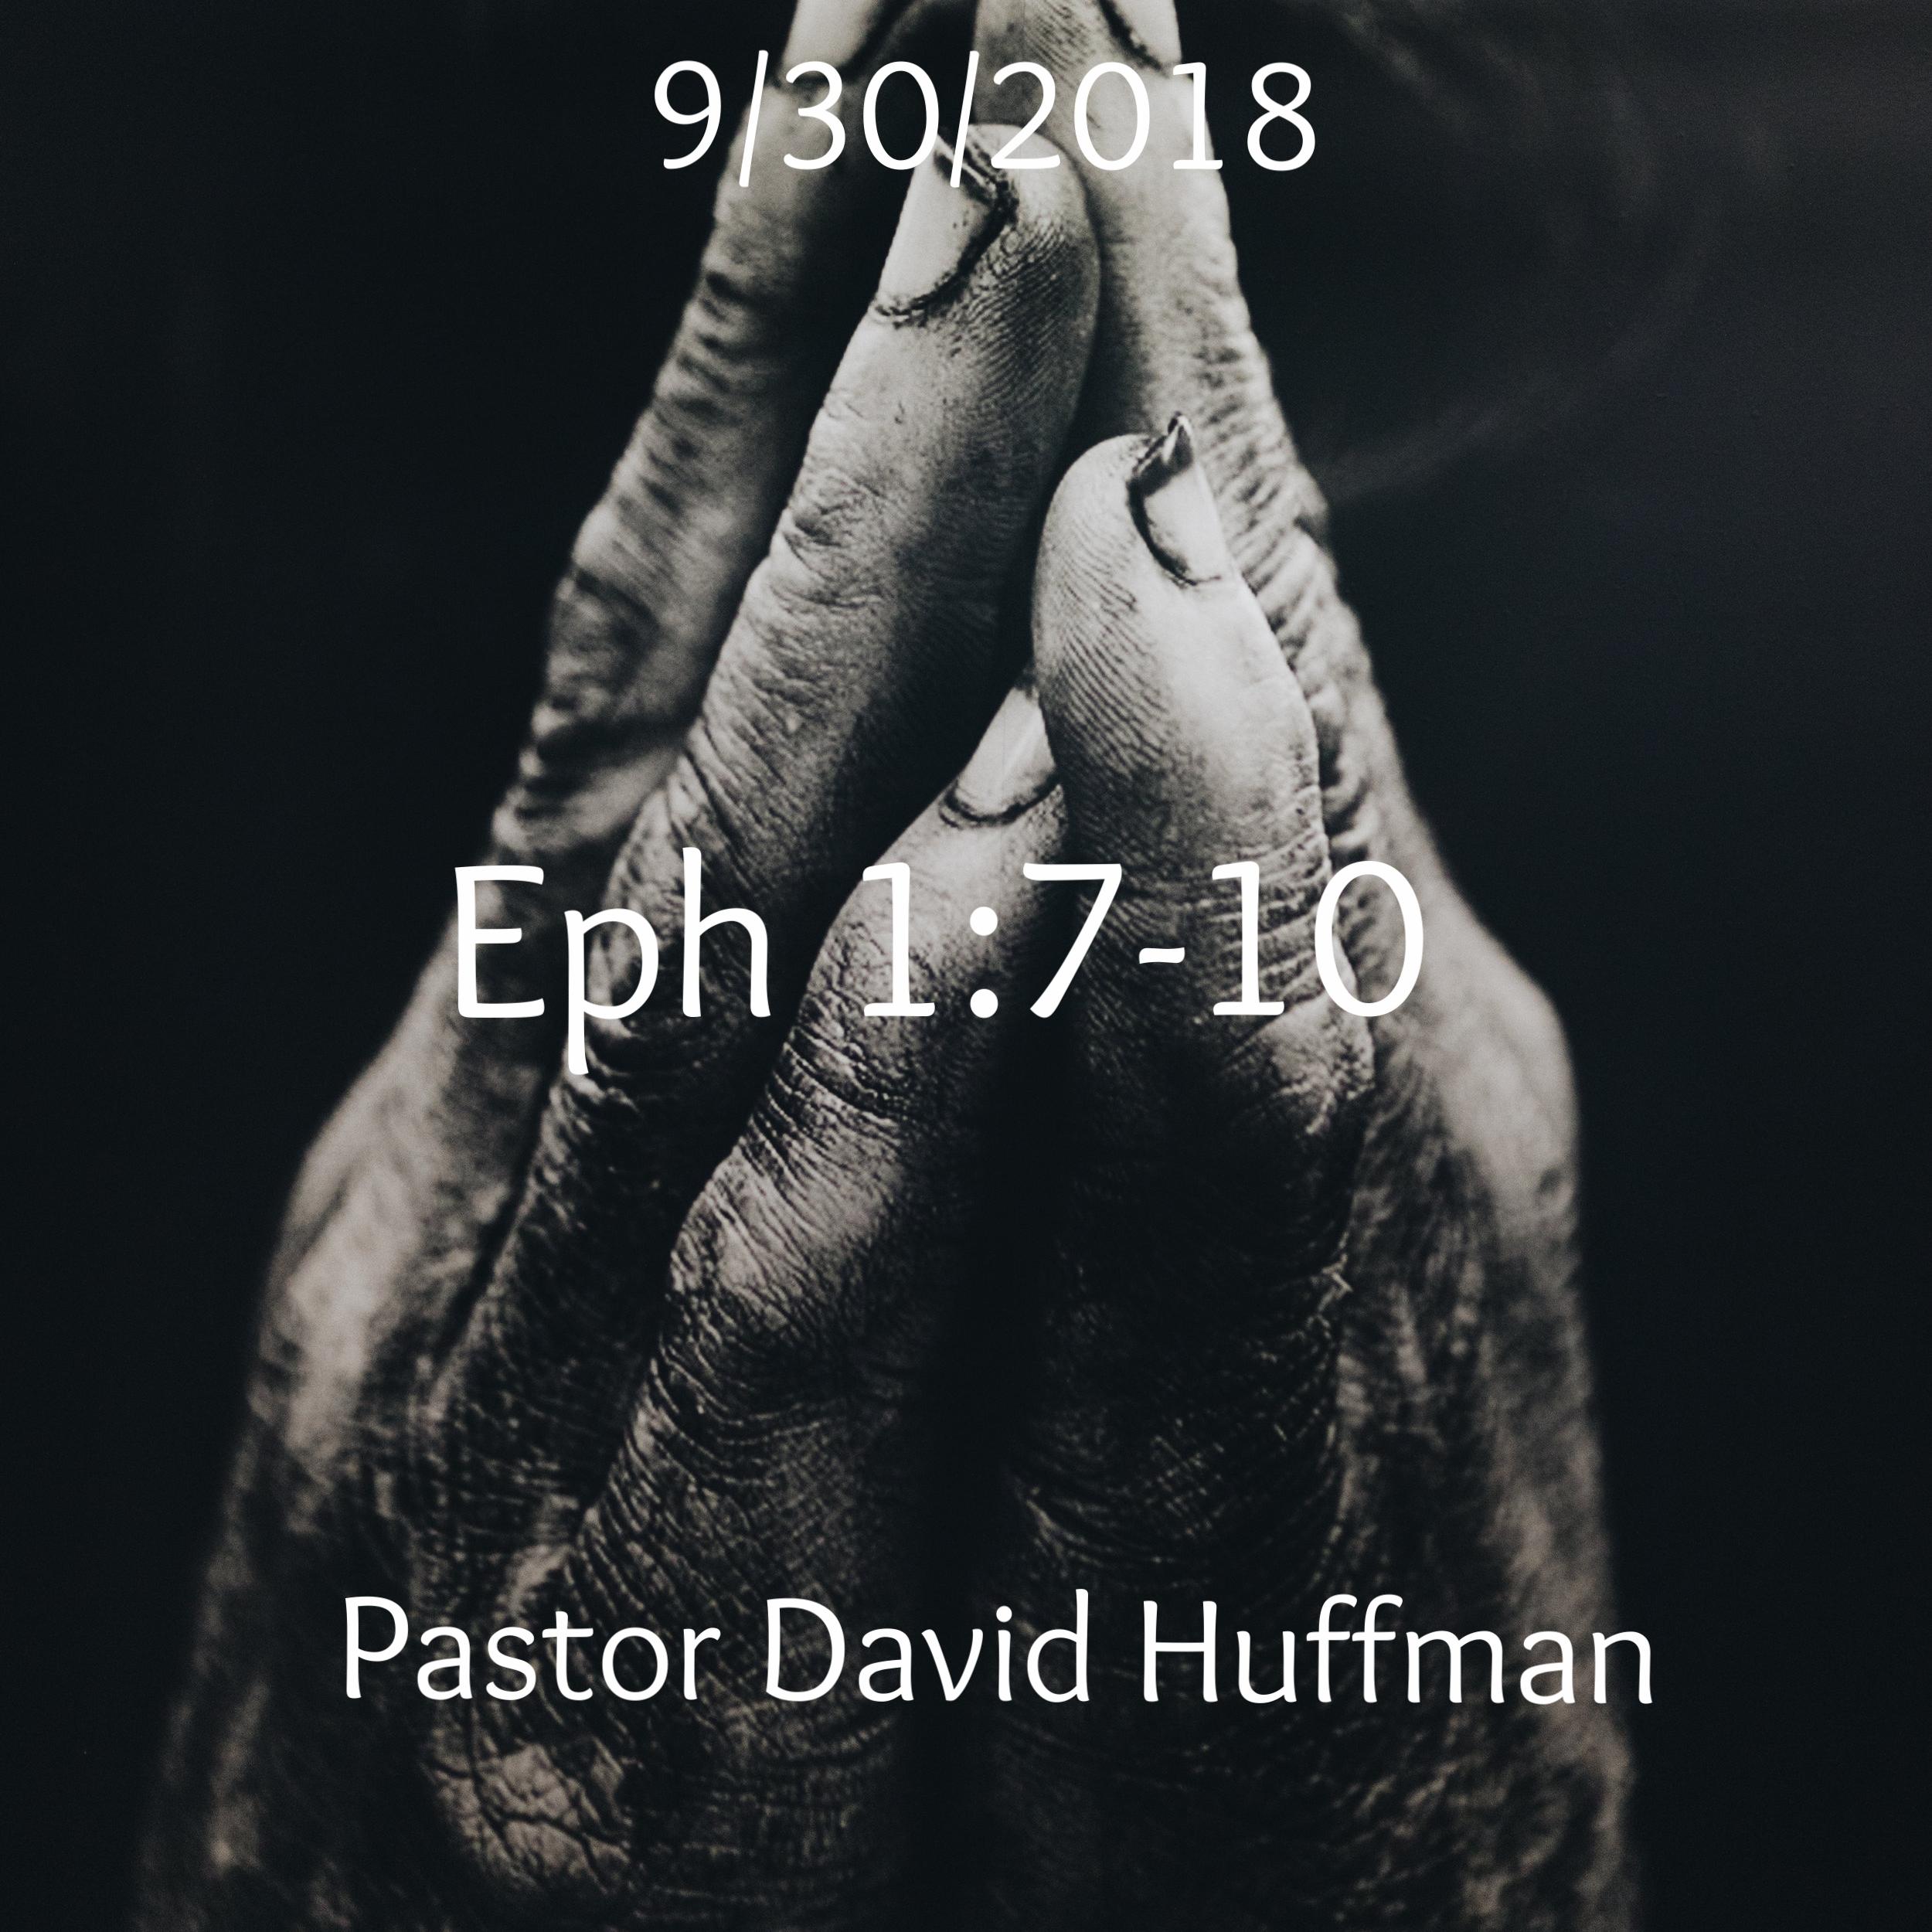 Eph 1:7-10